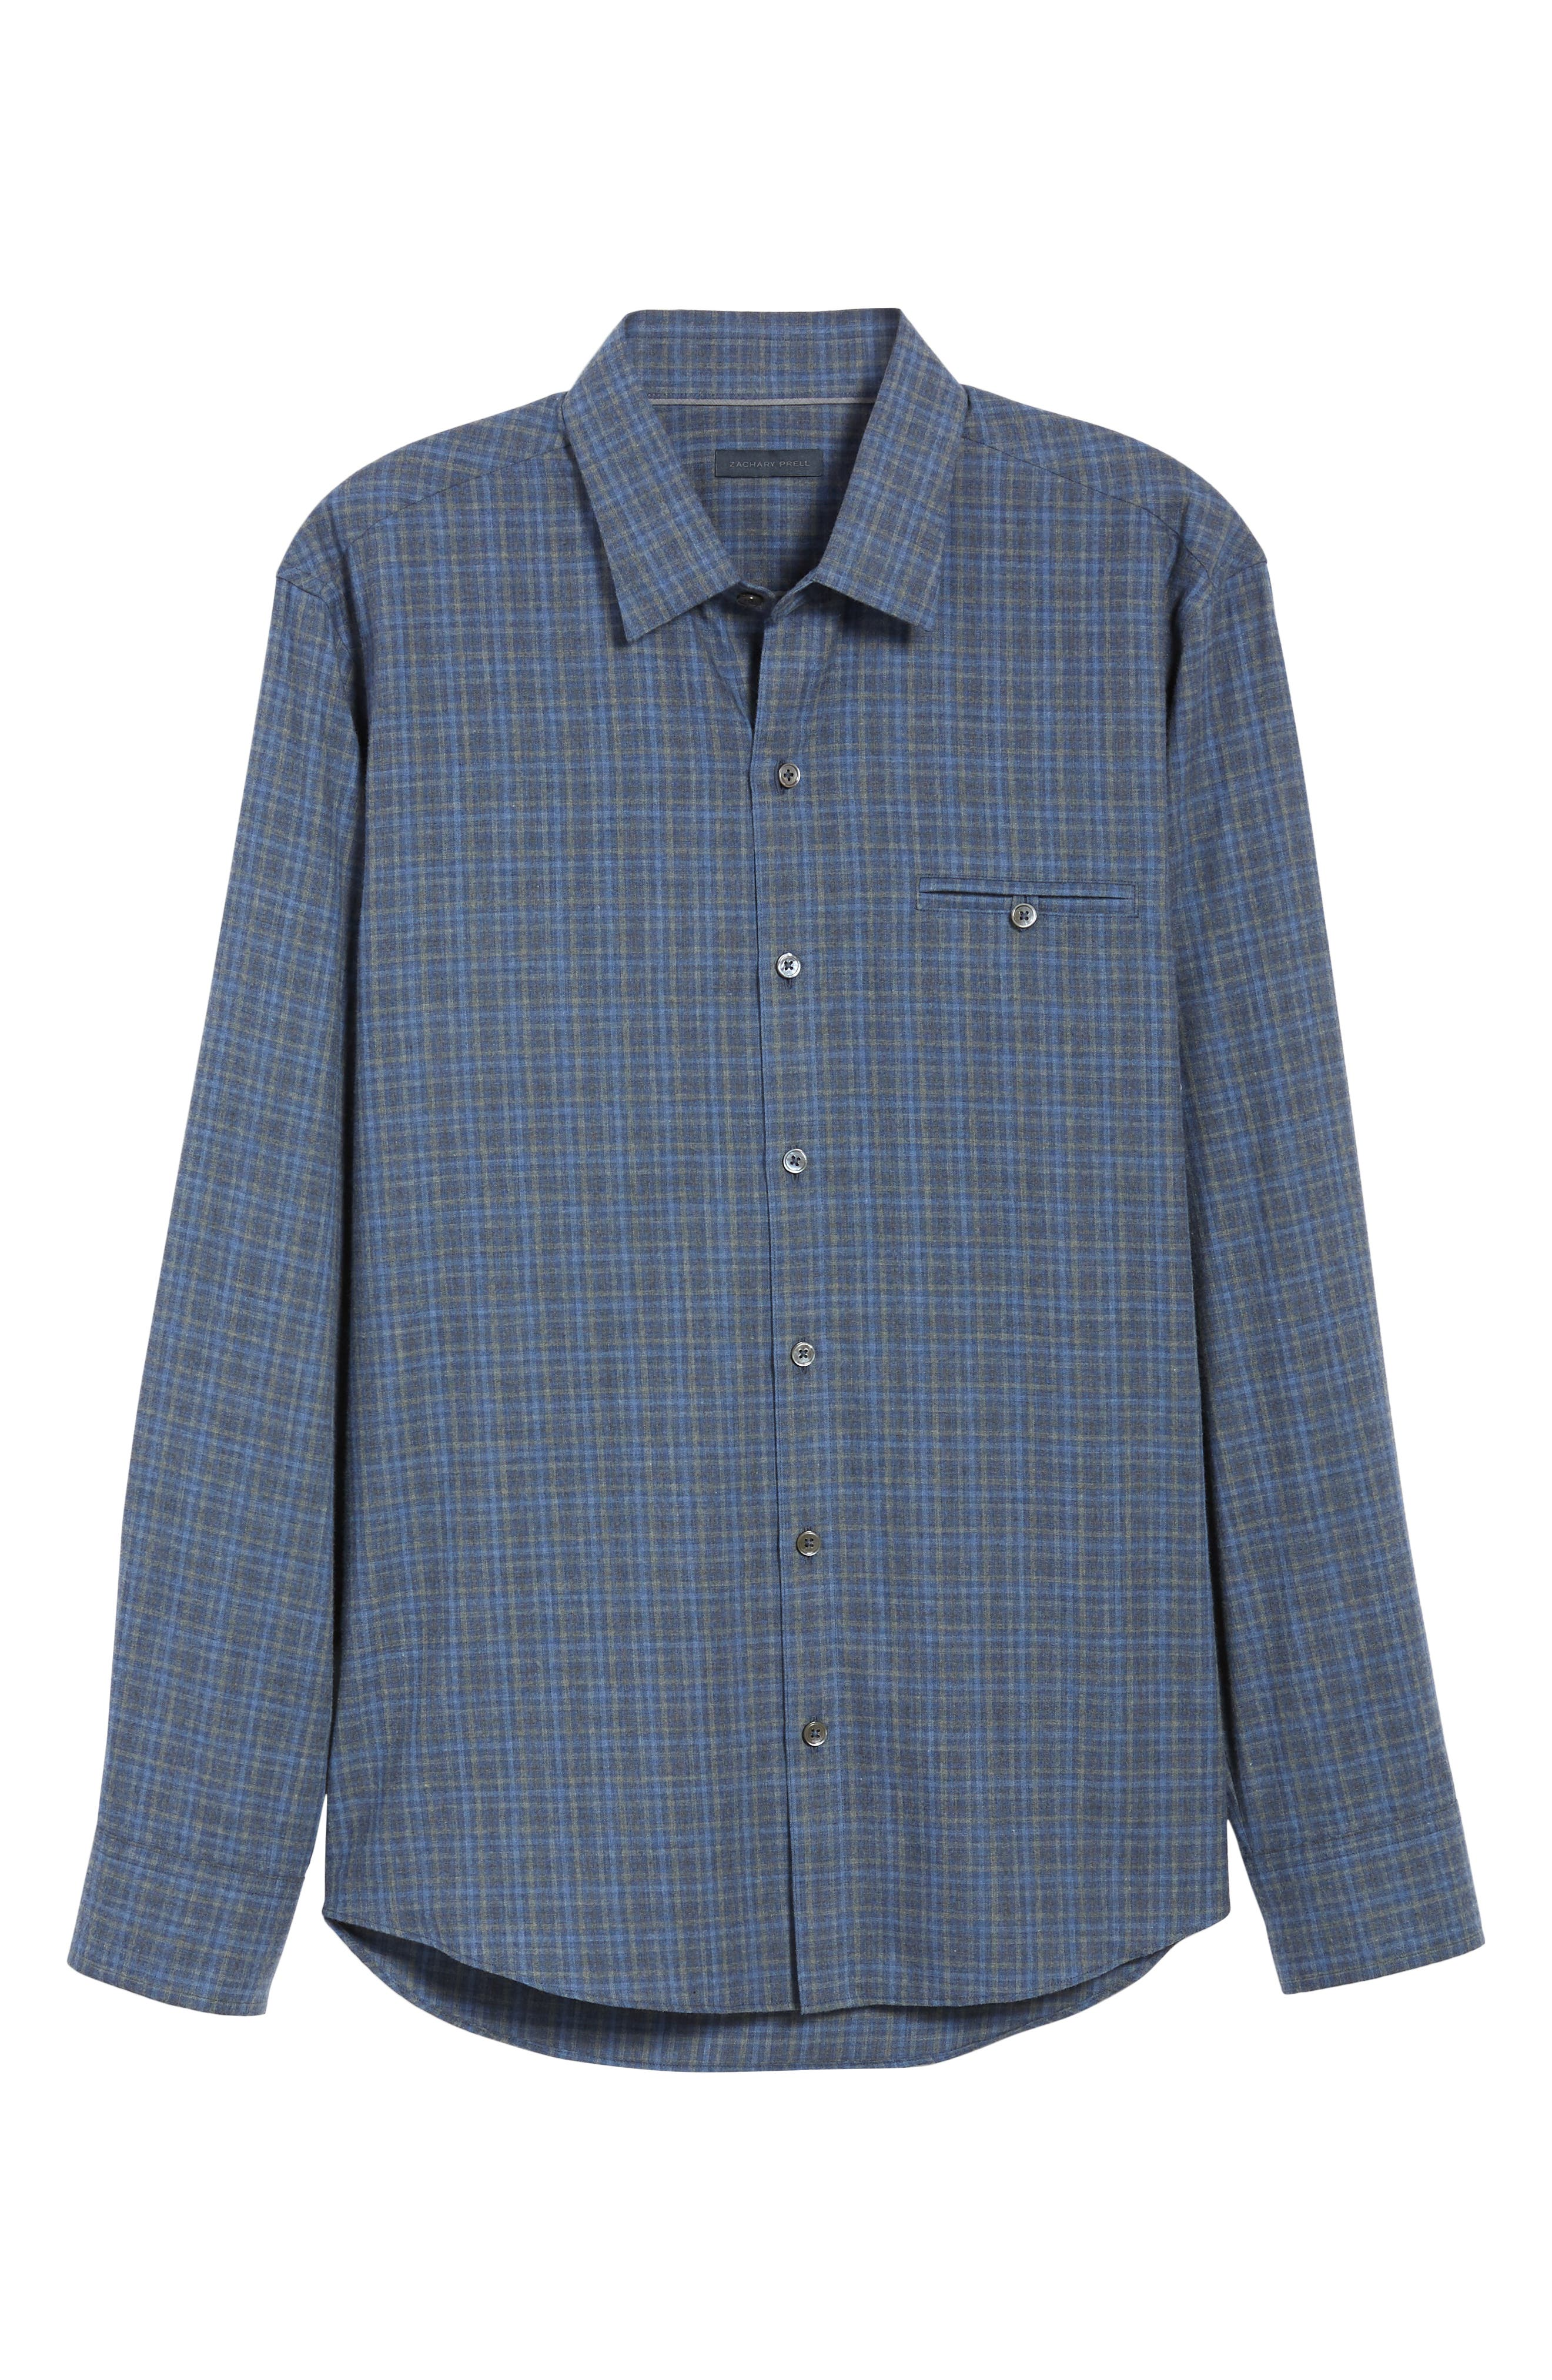 Nguyen Regular Fit Sport Shirt,                             Alternate thumbnail 5, color,                             DARK BLUE